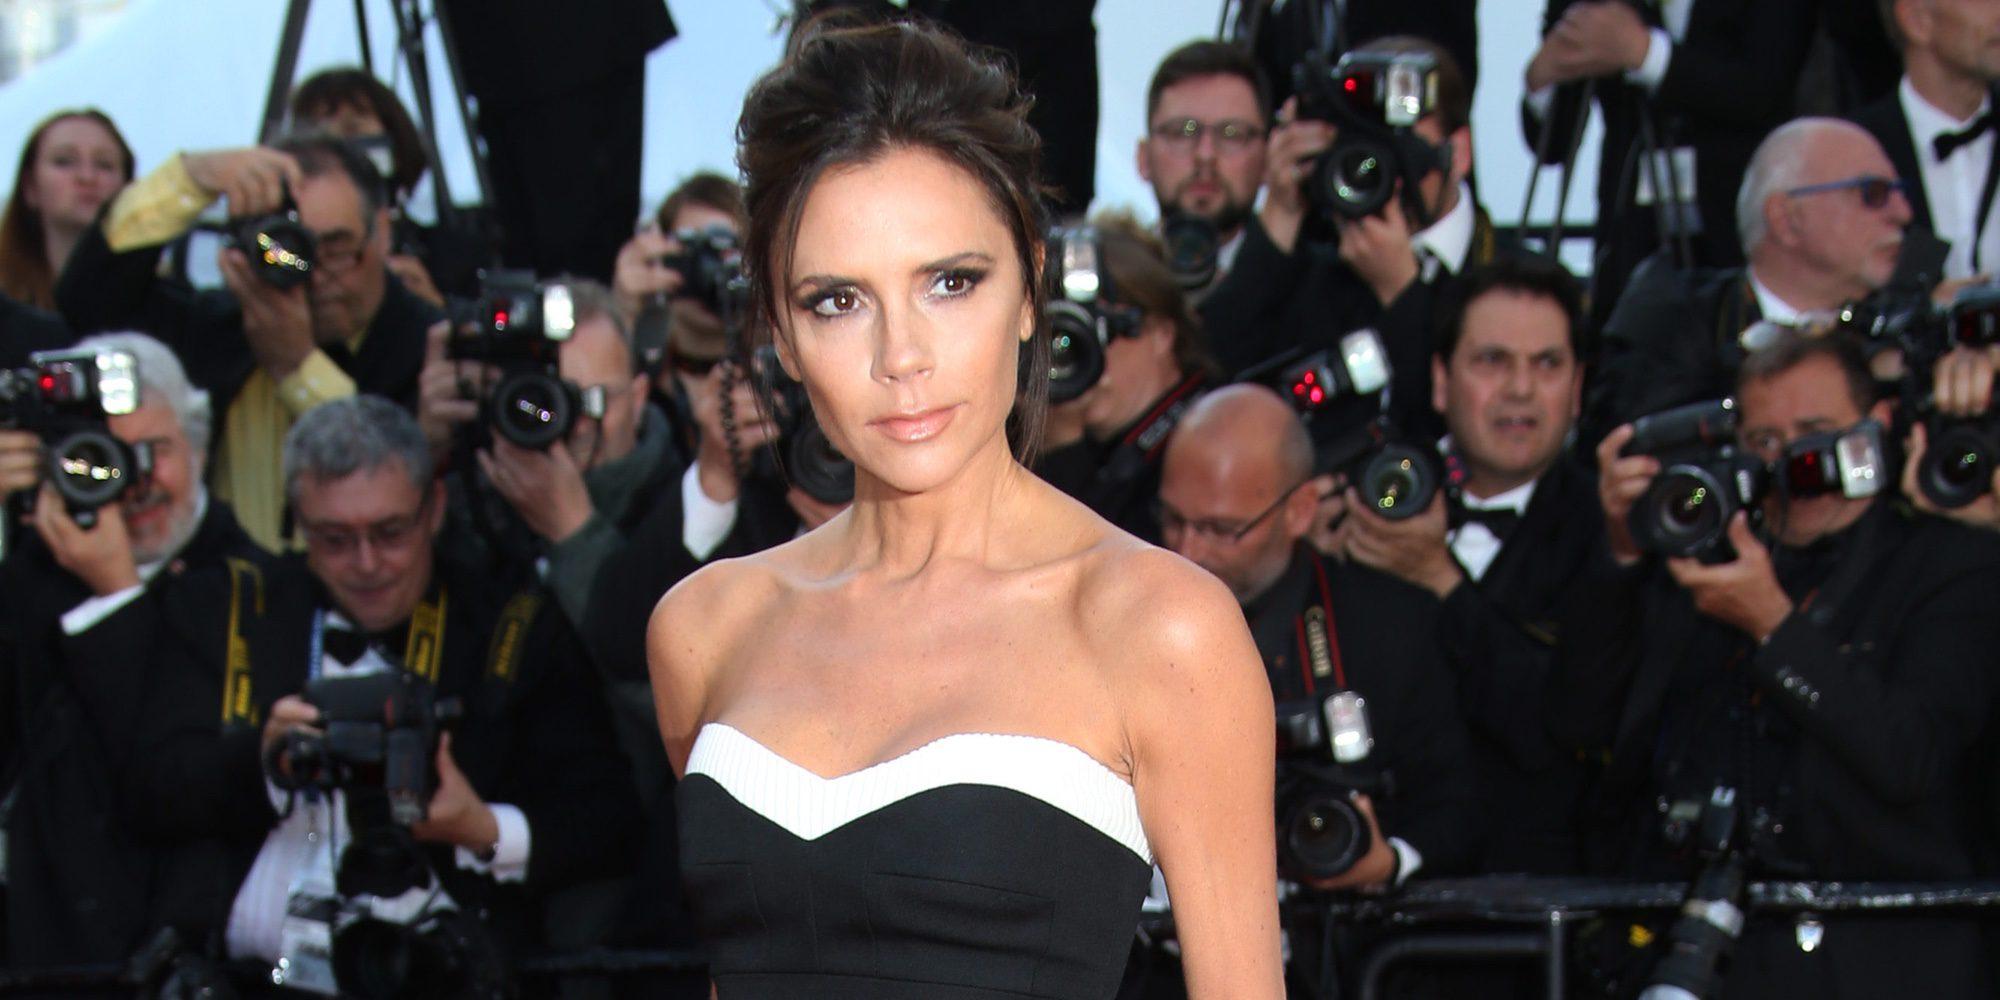 Victoria Beckham confiesa que estaba borracha cuando conoció a su marido David Beckham